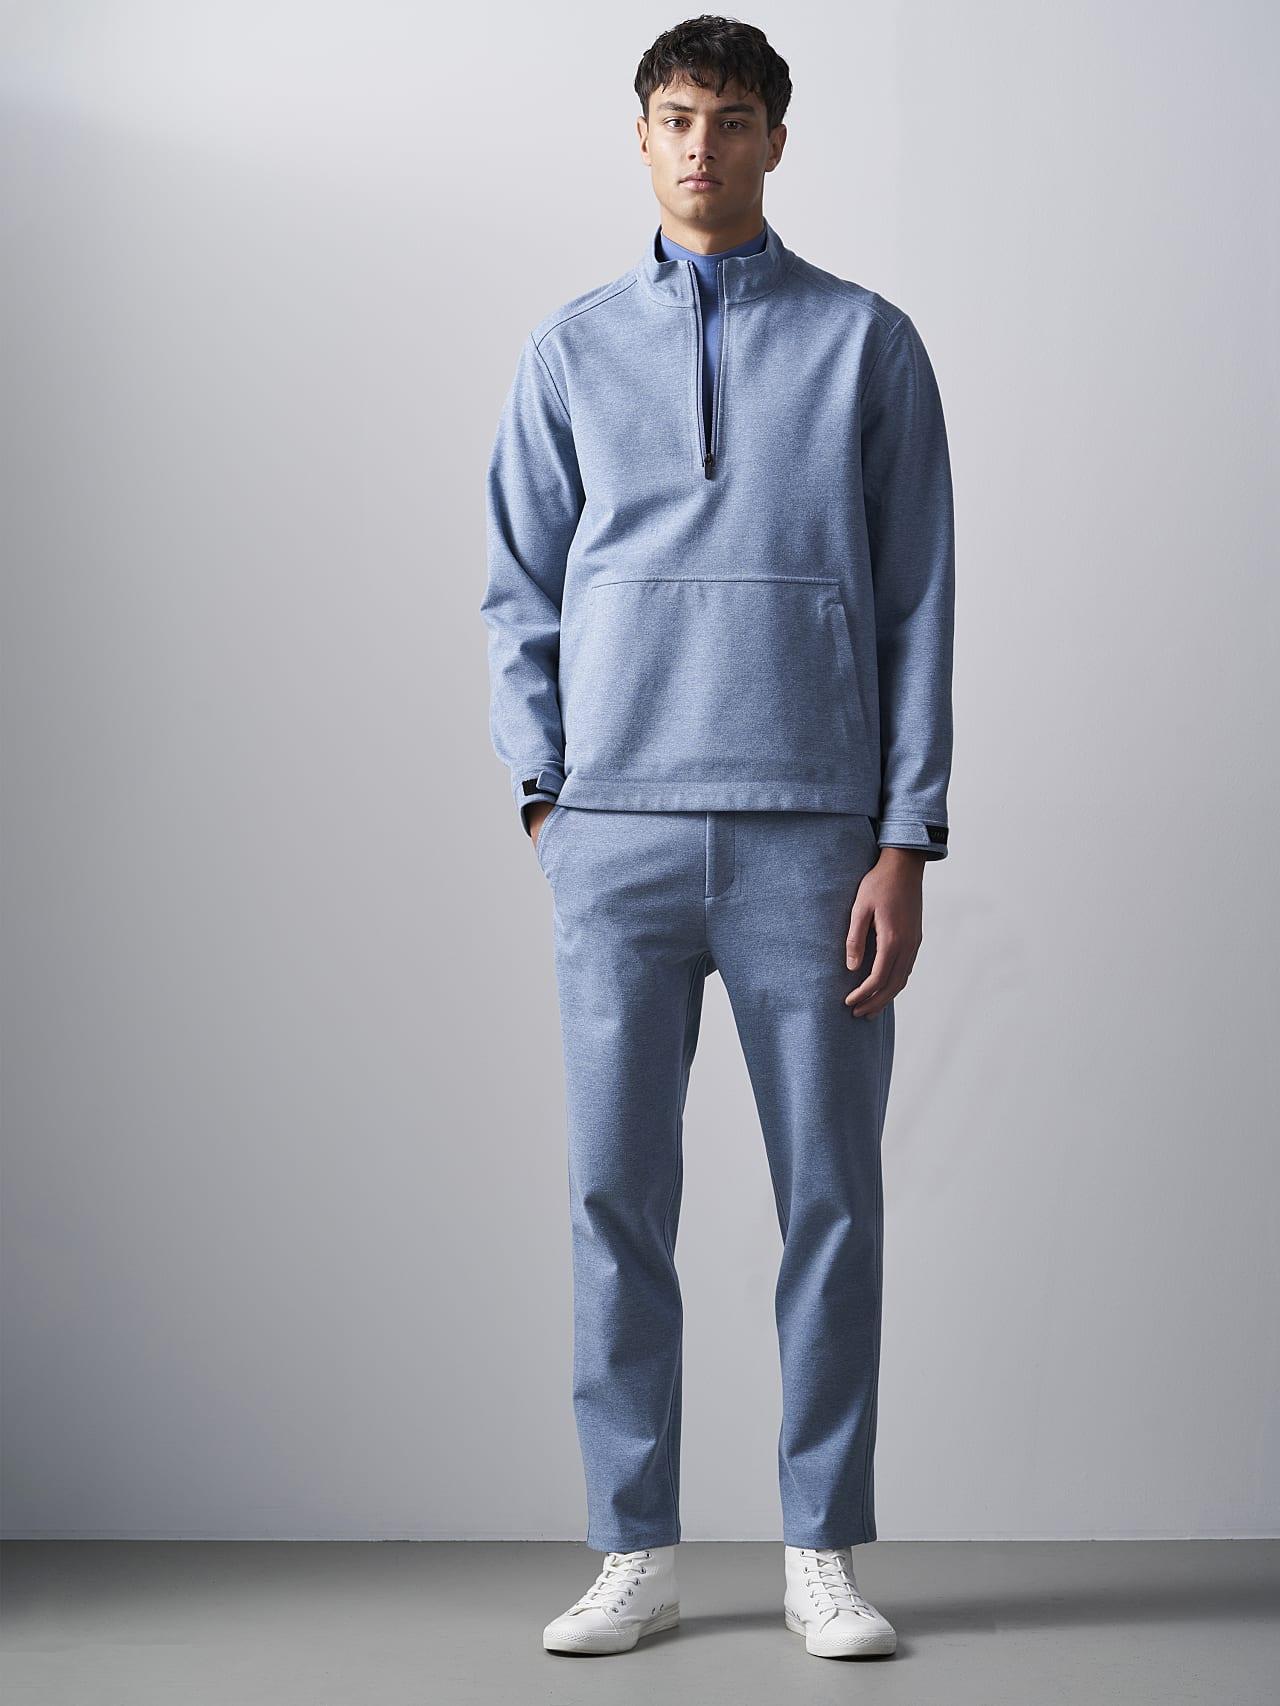 SROTO V1.Y5.02 Waterproof Half-Zip Sweatshirt medium blue Front Alpha Tauri